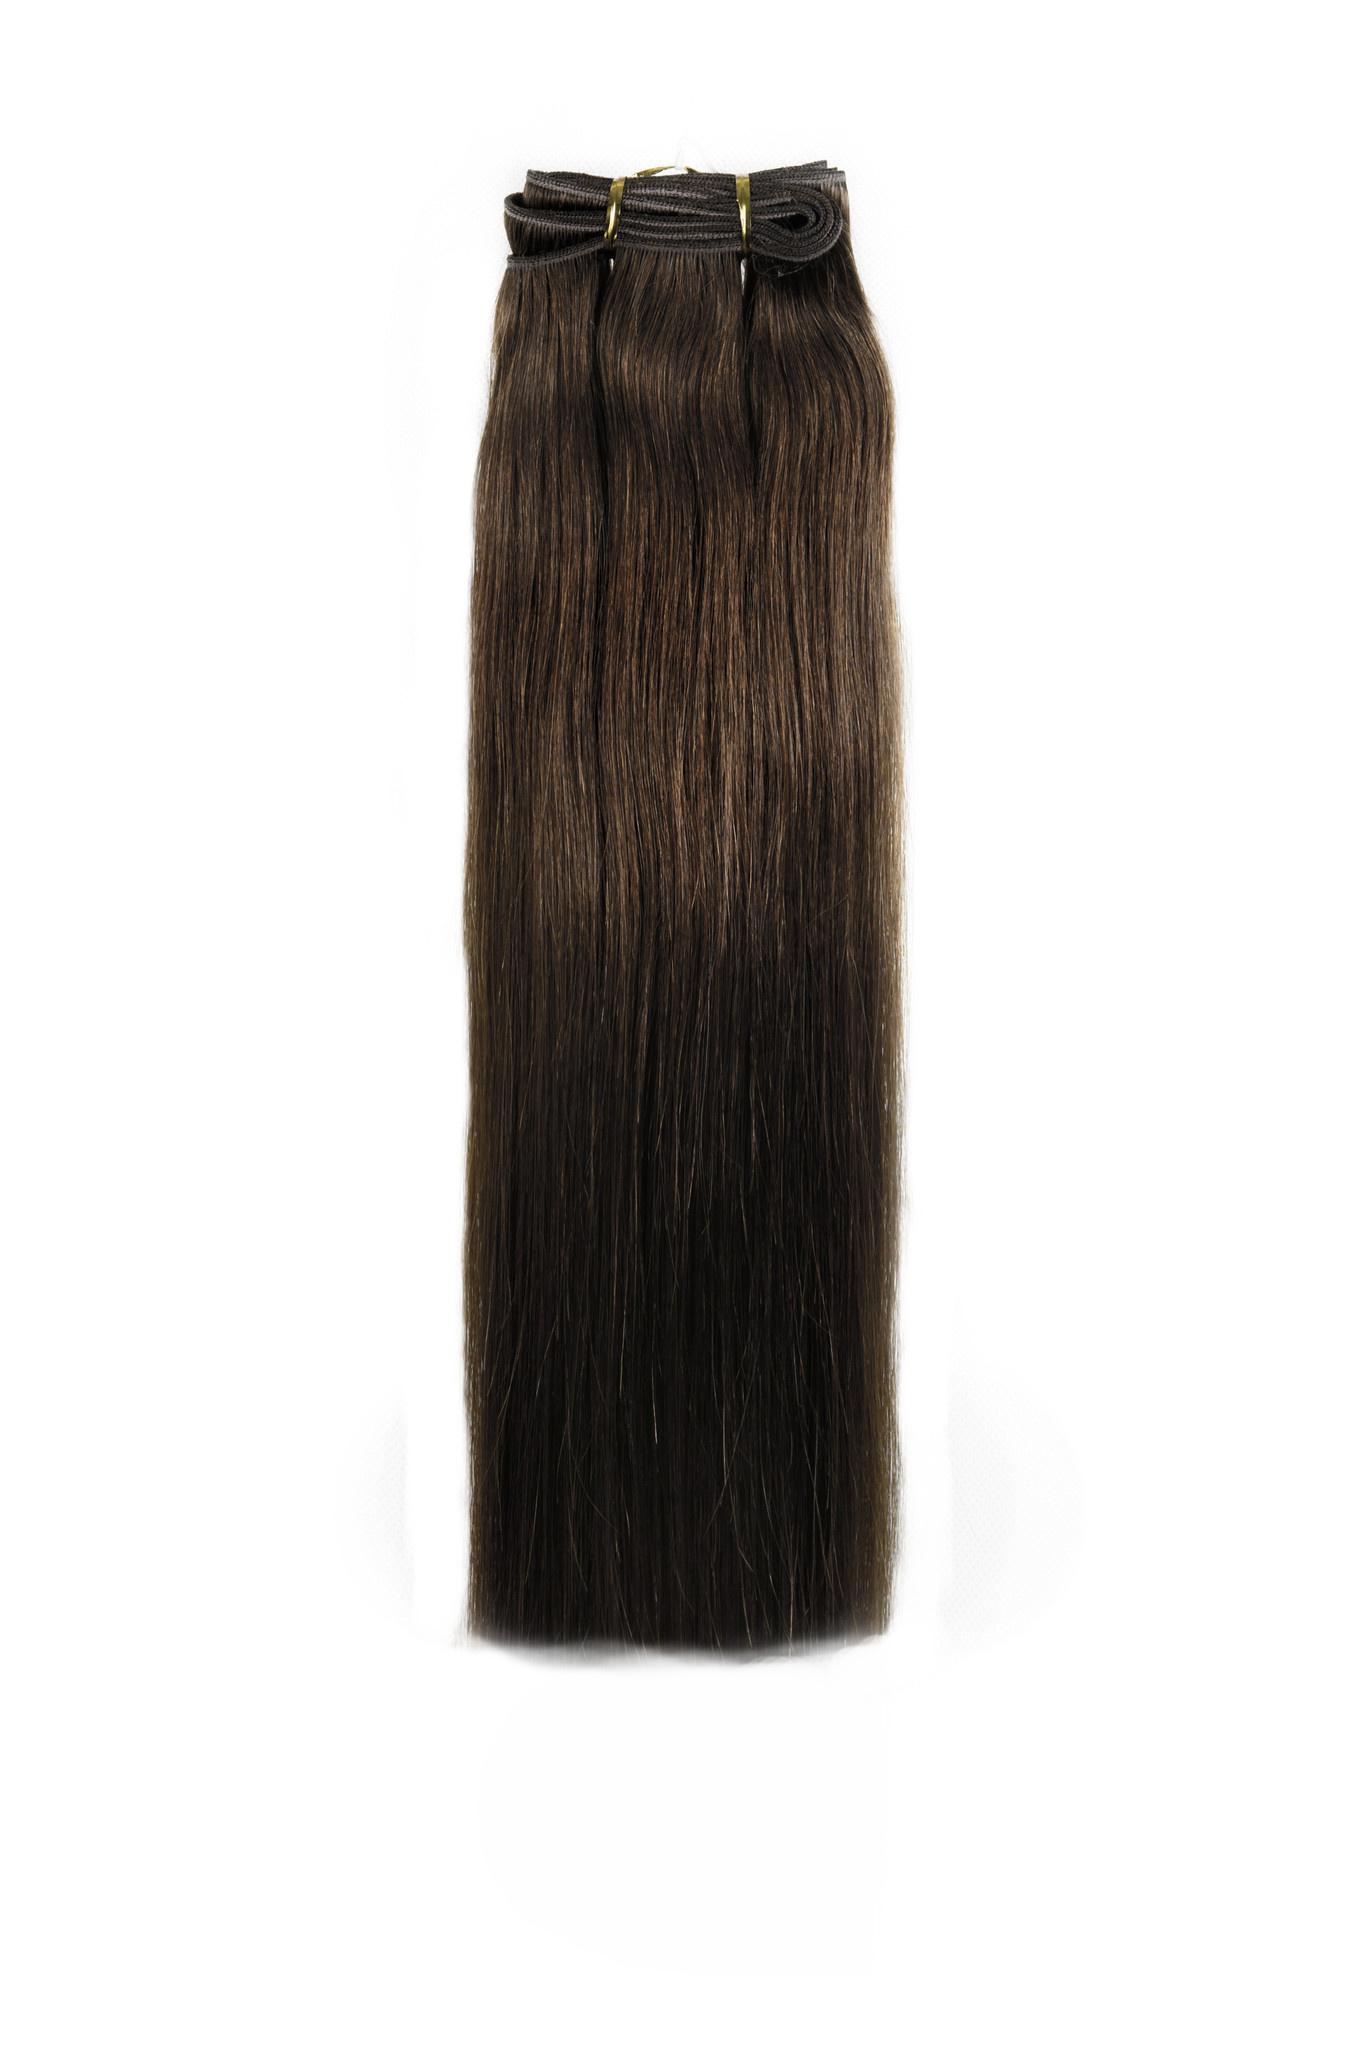 SHRI Indian (Shri) Hair weave (Steil) - #4 Chocolate Brown